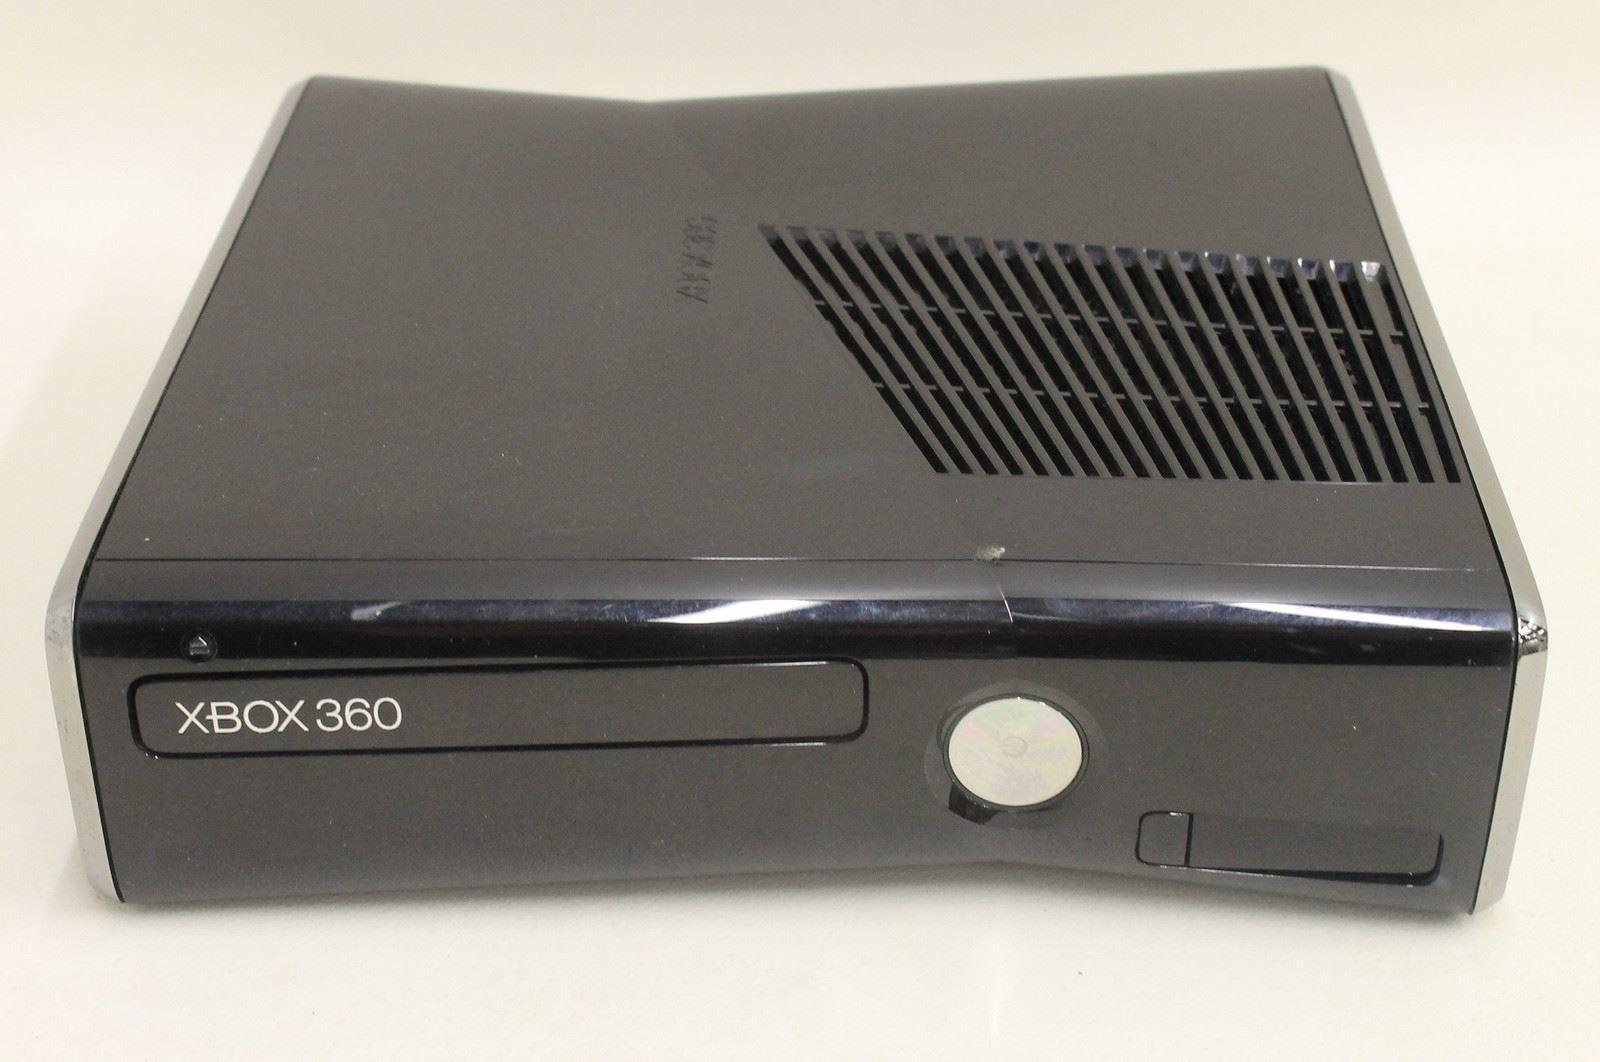 MICROSOFT XBox 360 S 250GB Glossy Black Games Console ...